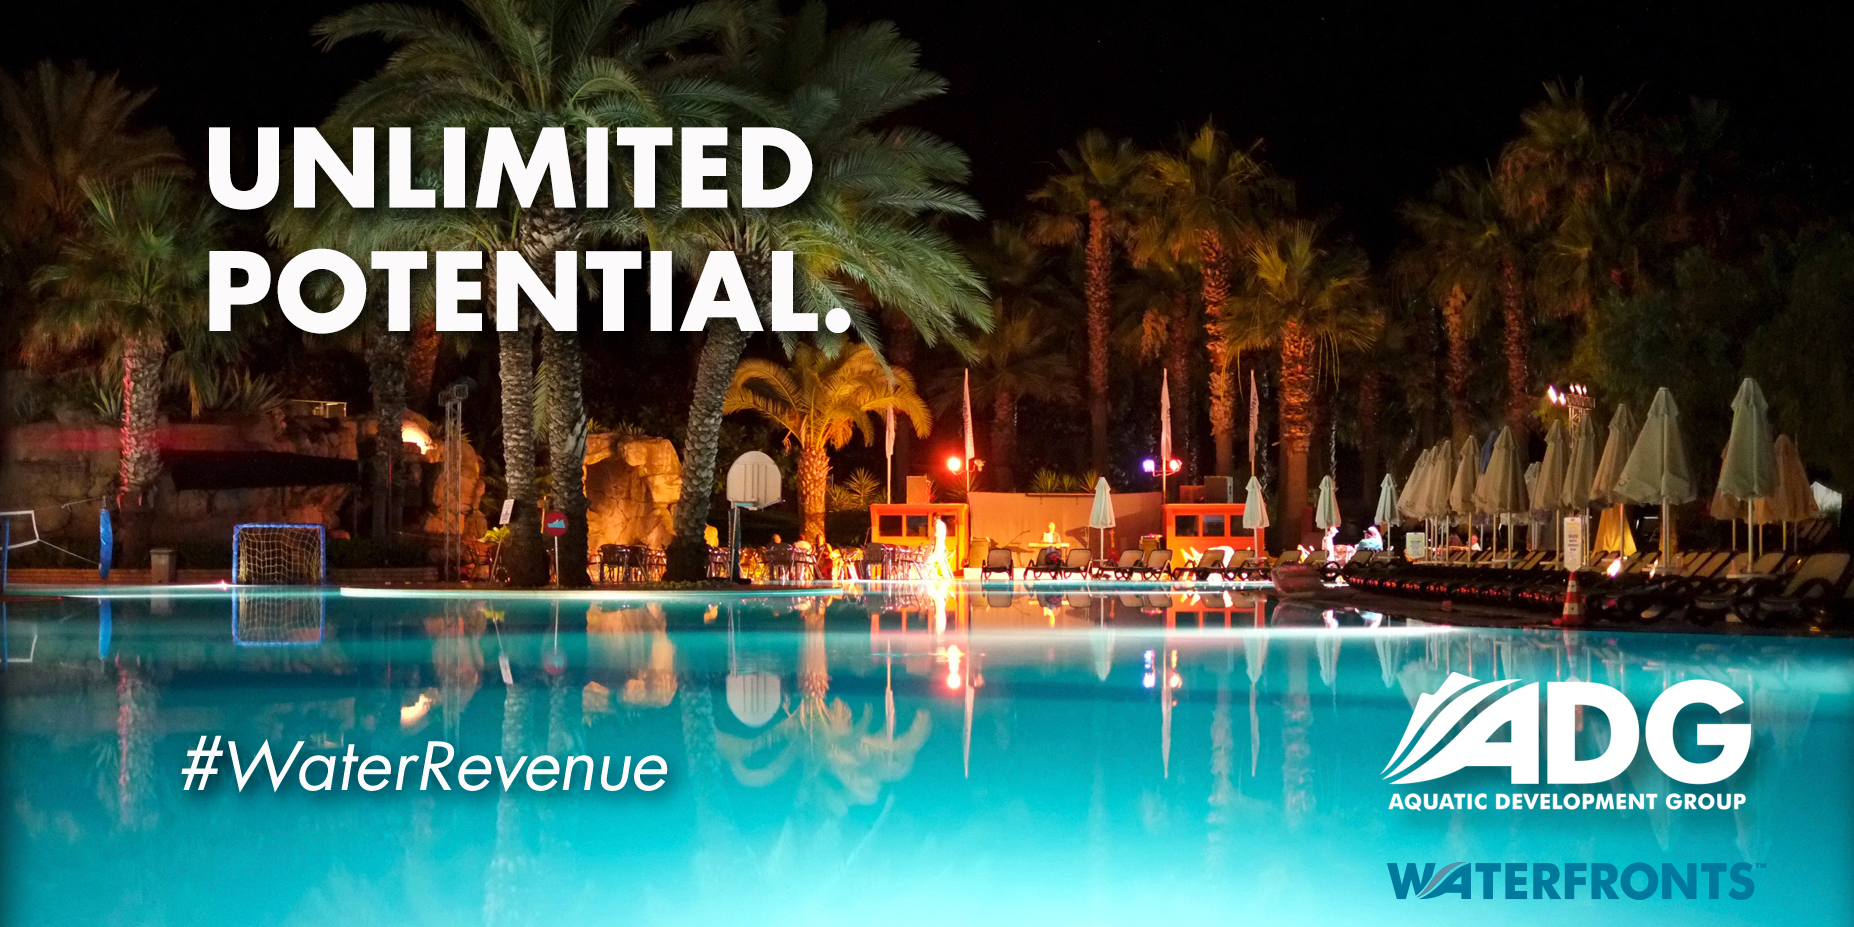 Resort Waterfront Pool Potential